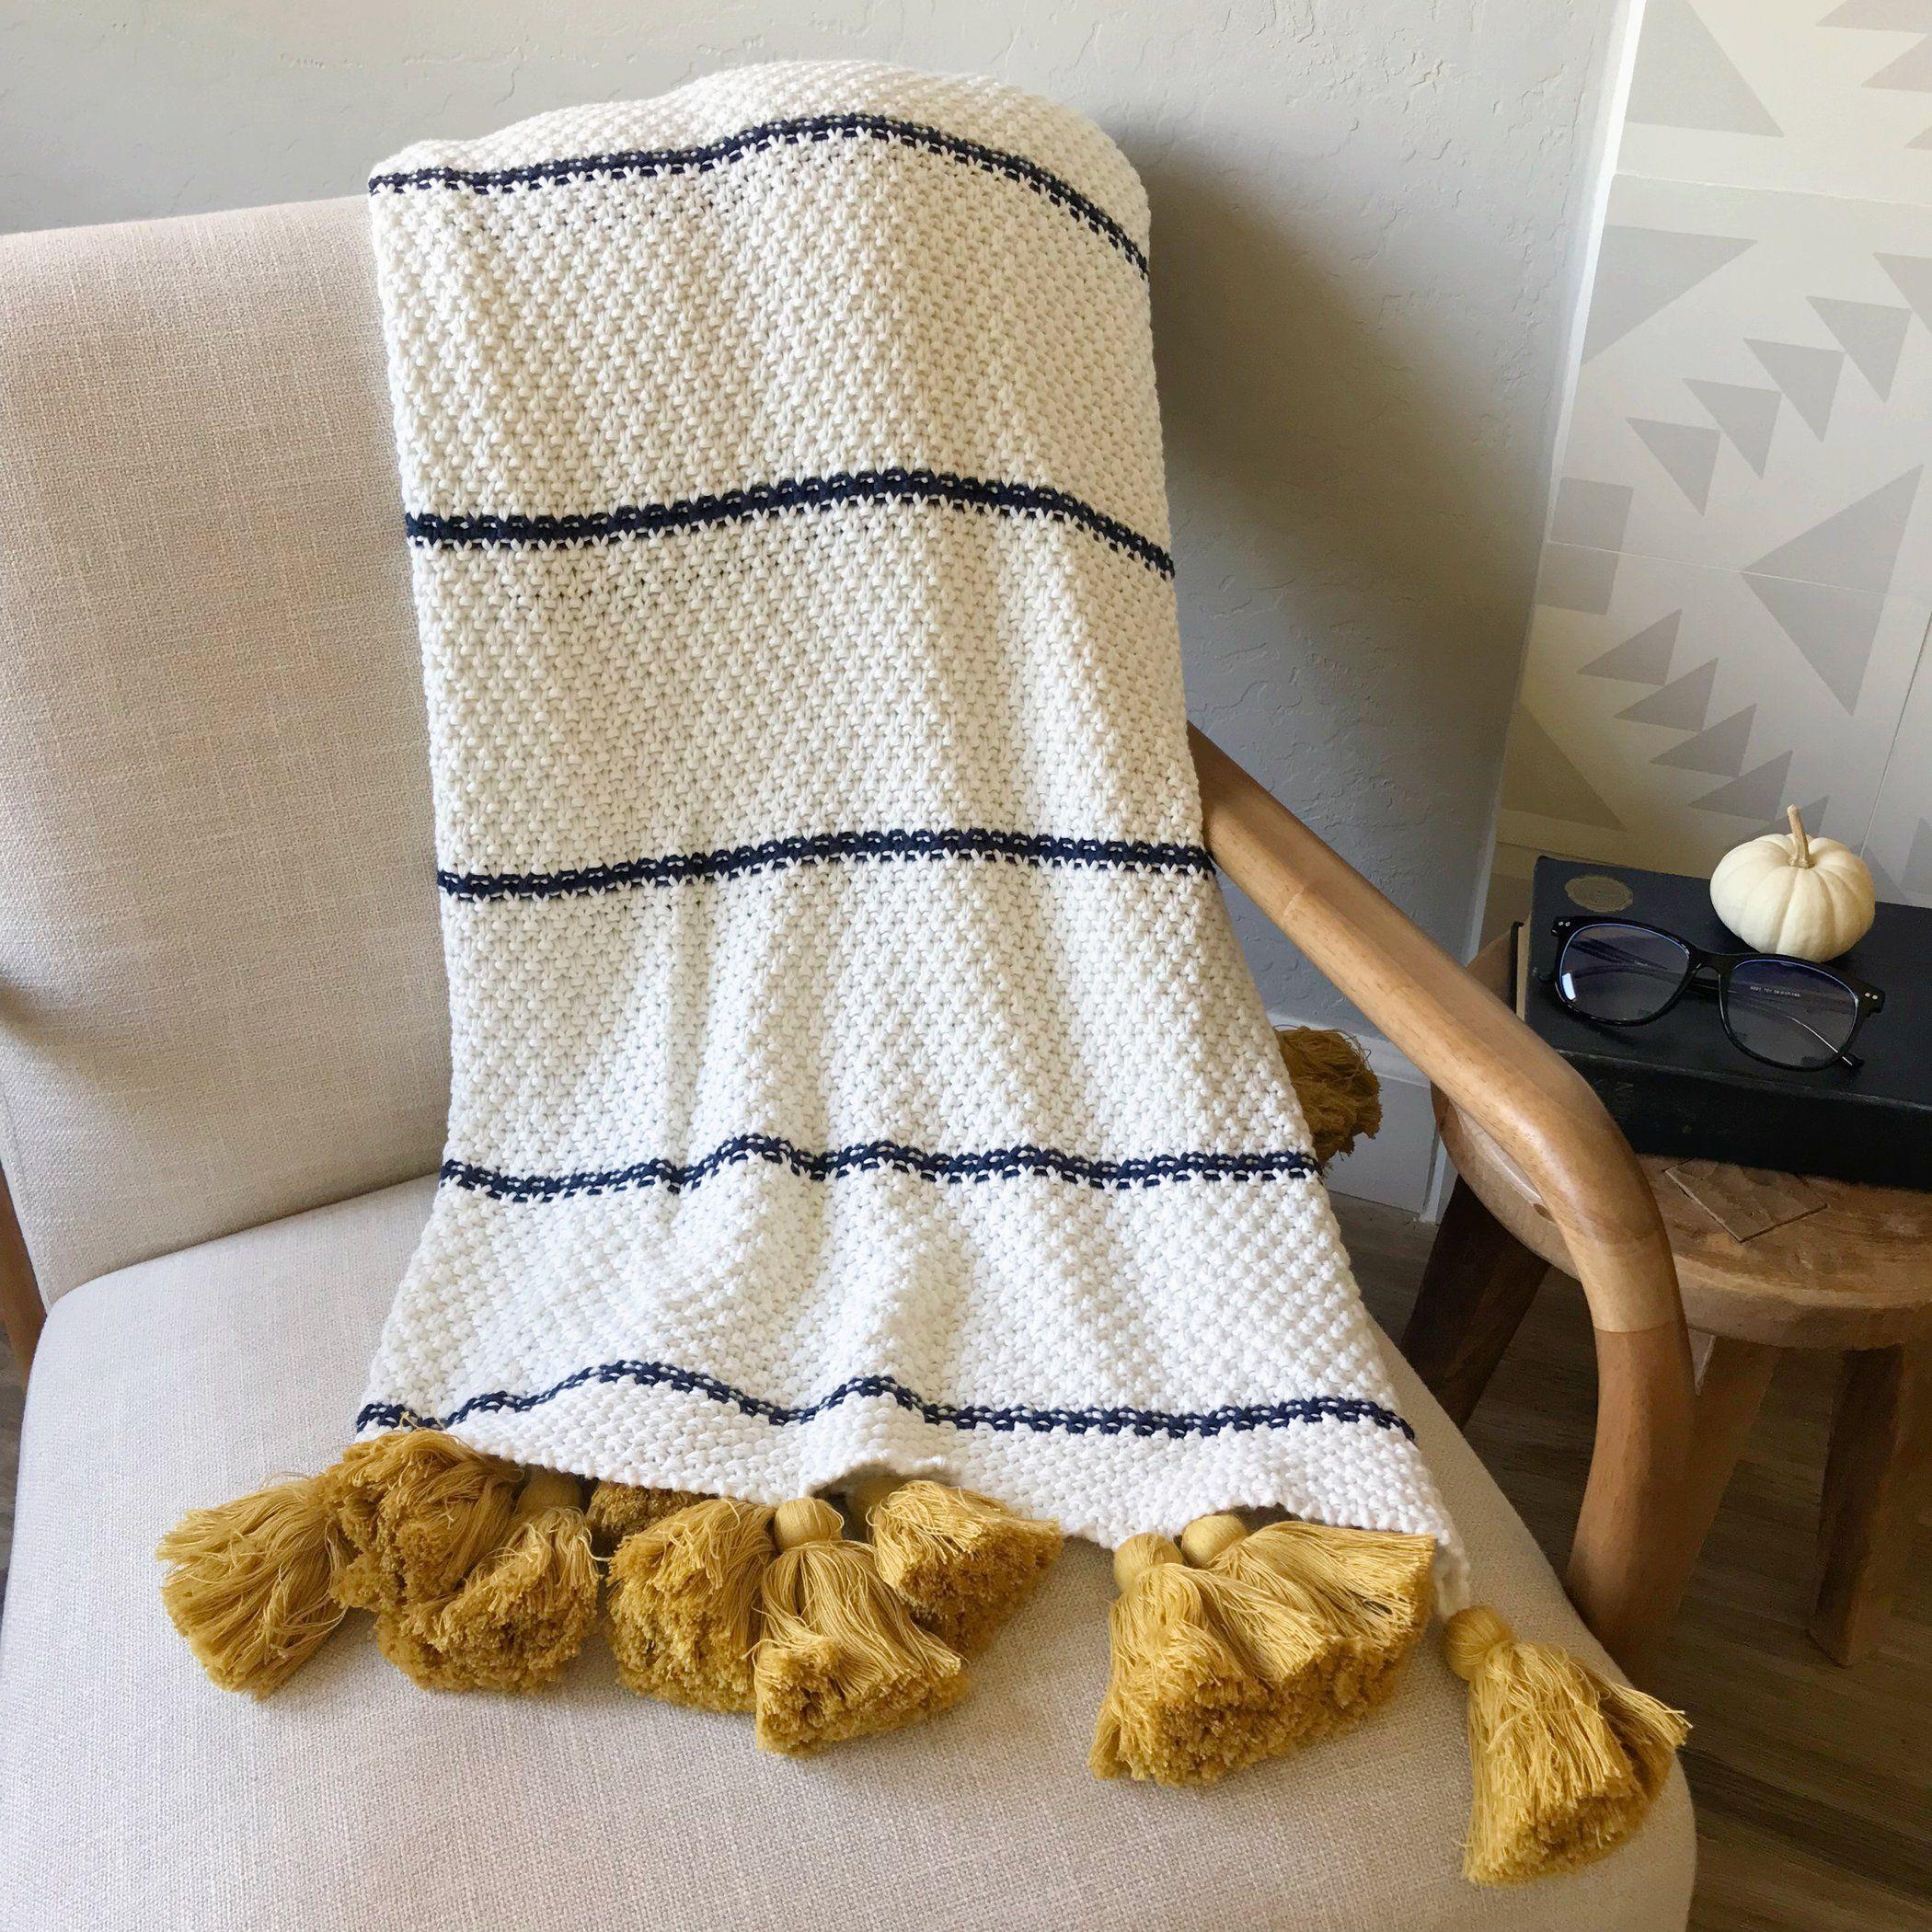 Jana Navy Ivory Throw Blanket W Gold Tassels Ivory Throw Blanket Throw Blanket White Throw Blanket